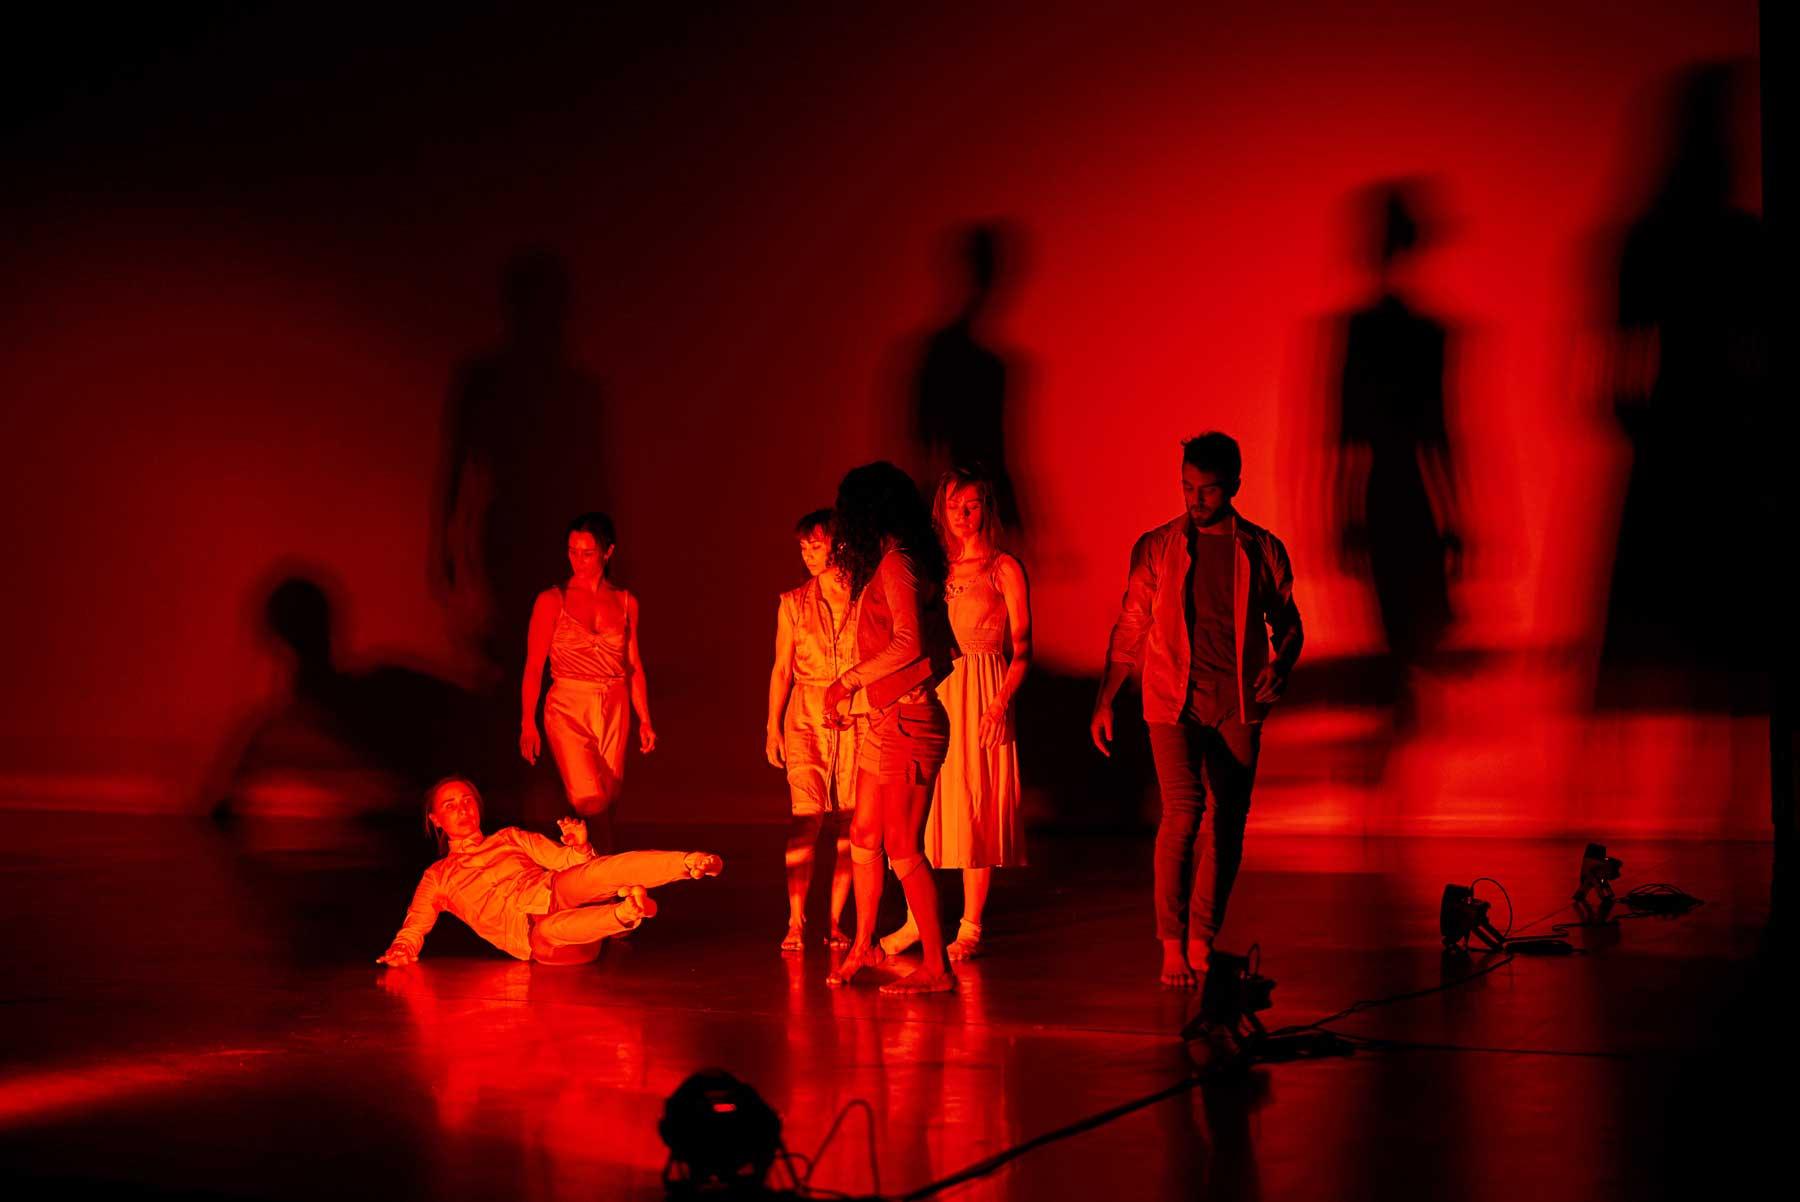 mardi-culturel-td-danse-danse-kyra-jean-green-trip-the-light-fantastic-16.jpg